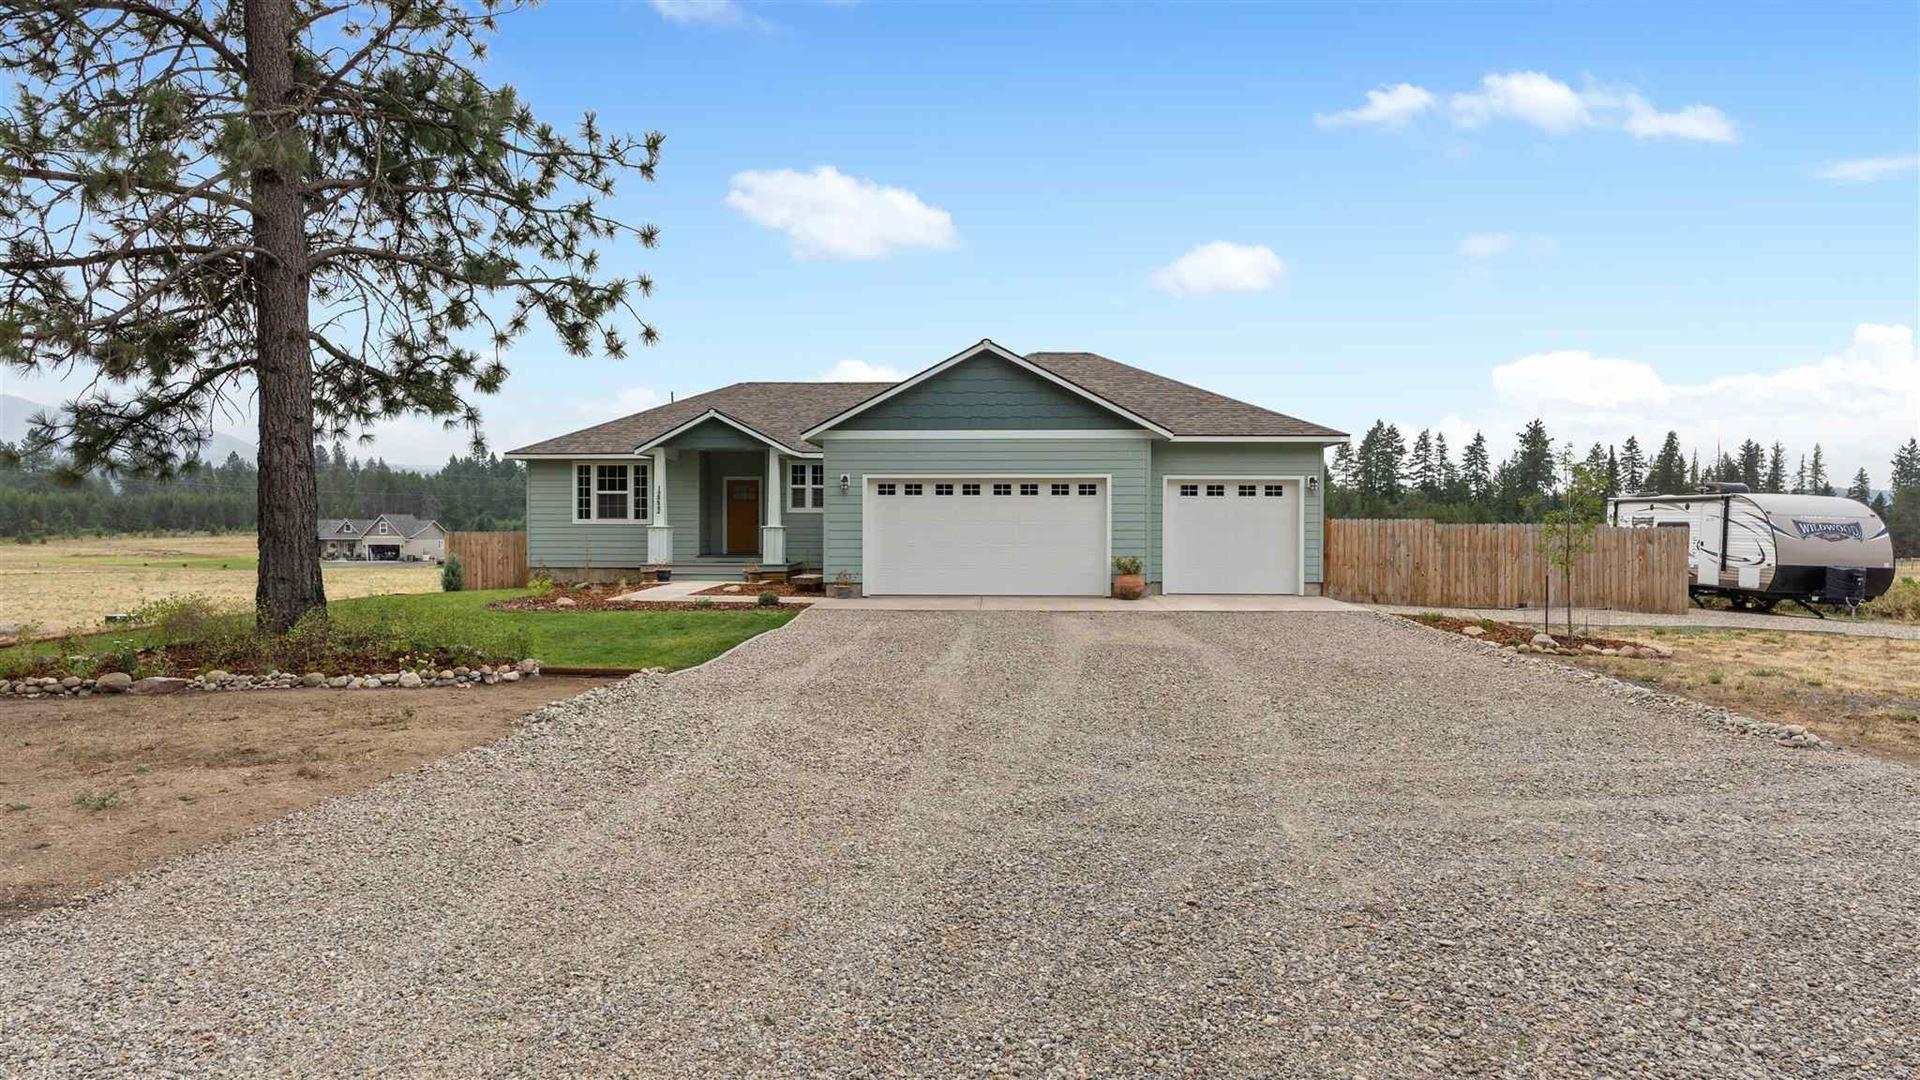 12222 E Nelson Rd, Elk, WA 99009-9609 - #: 202121806